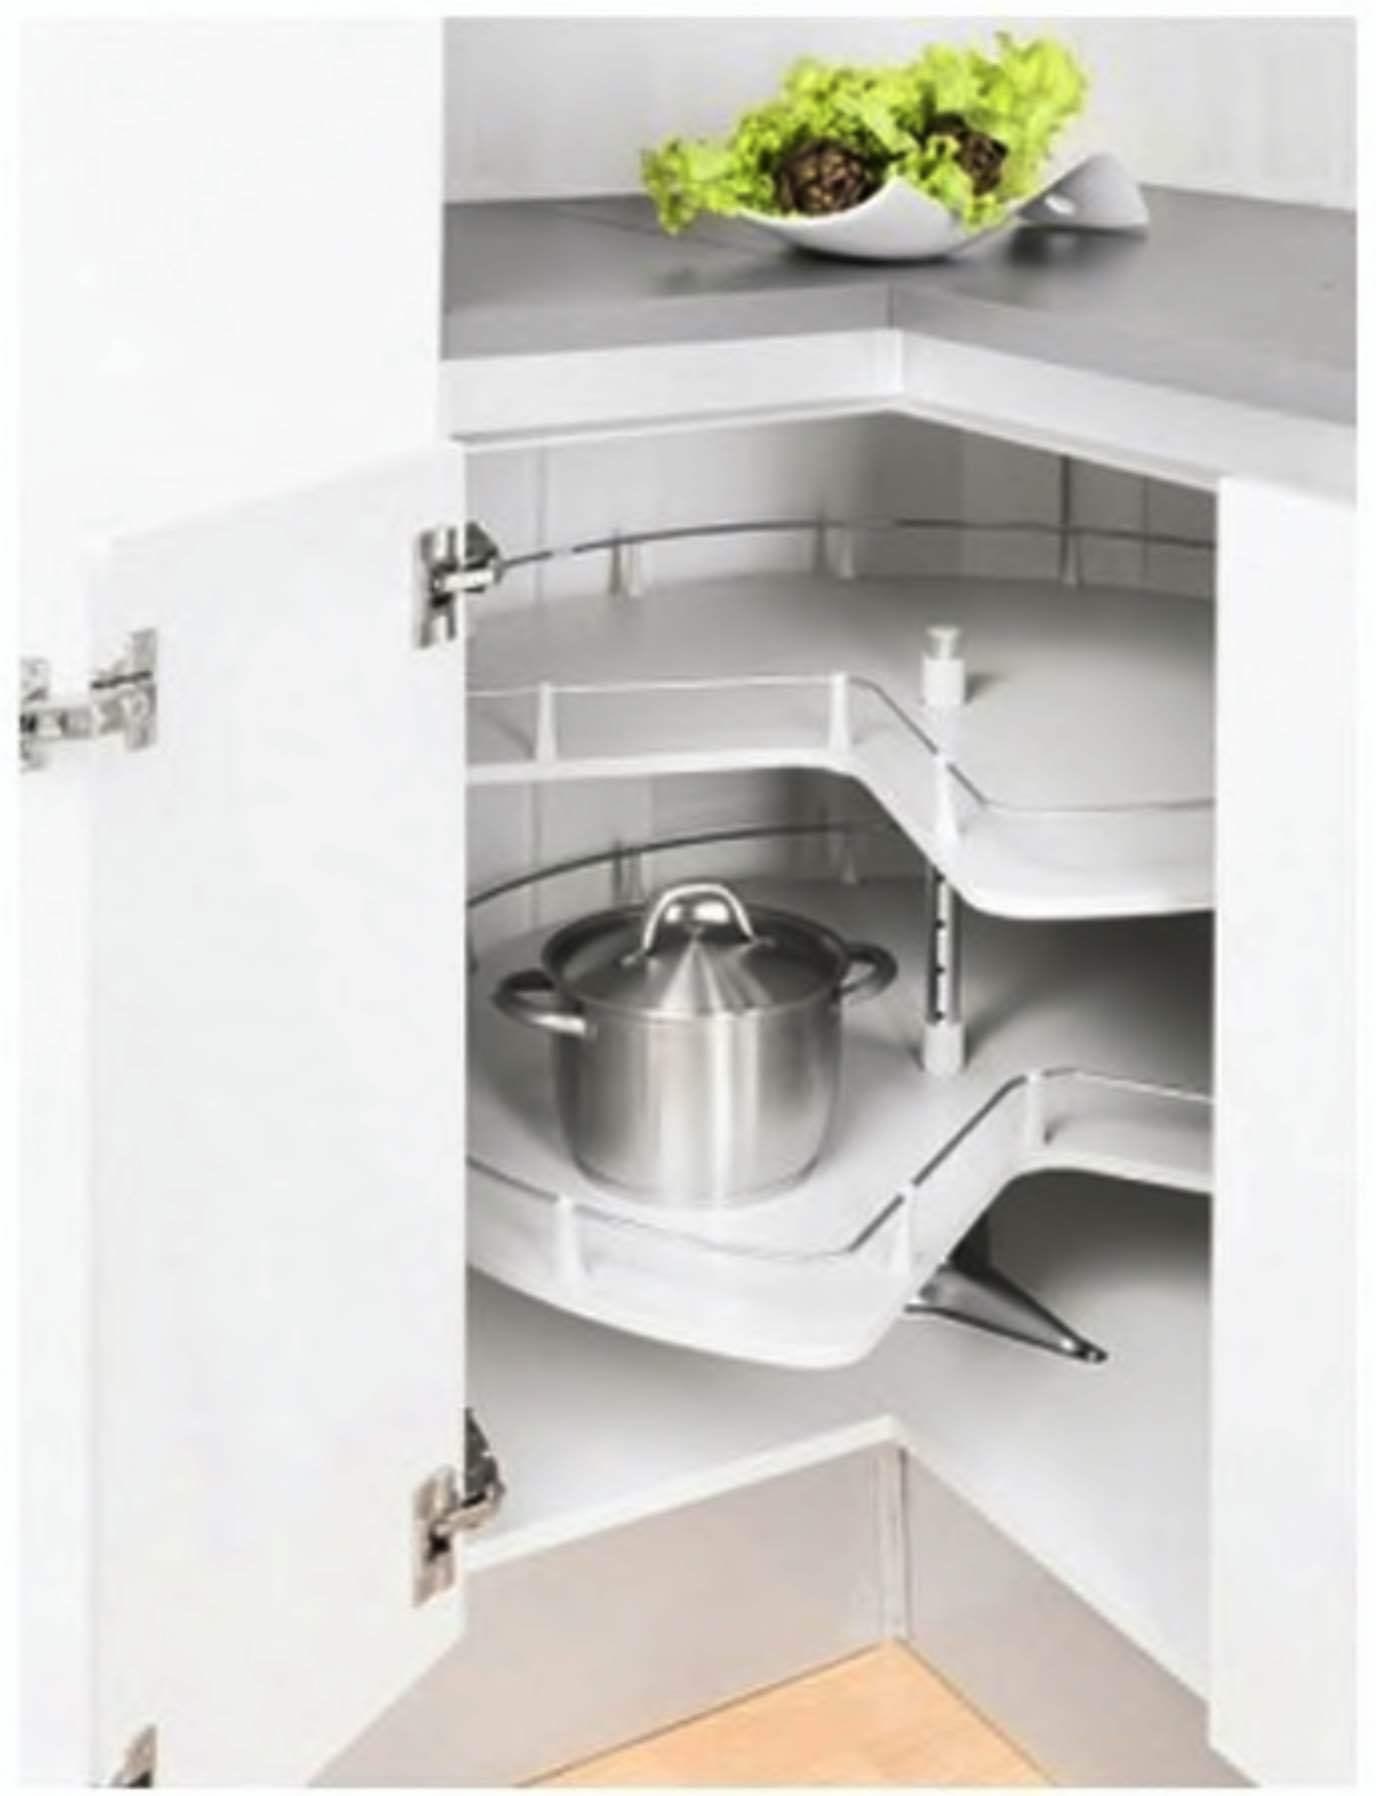 2 Shelf Carousel In White Mdf For The 90x90 Corner Base Cabinet Faktum Online Store